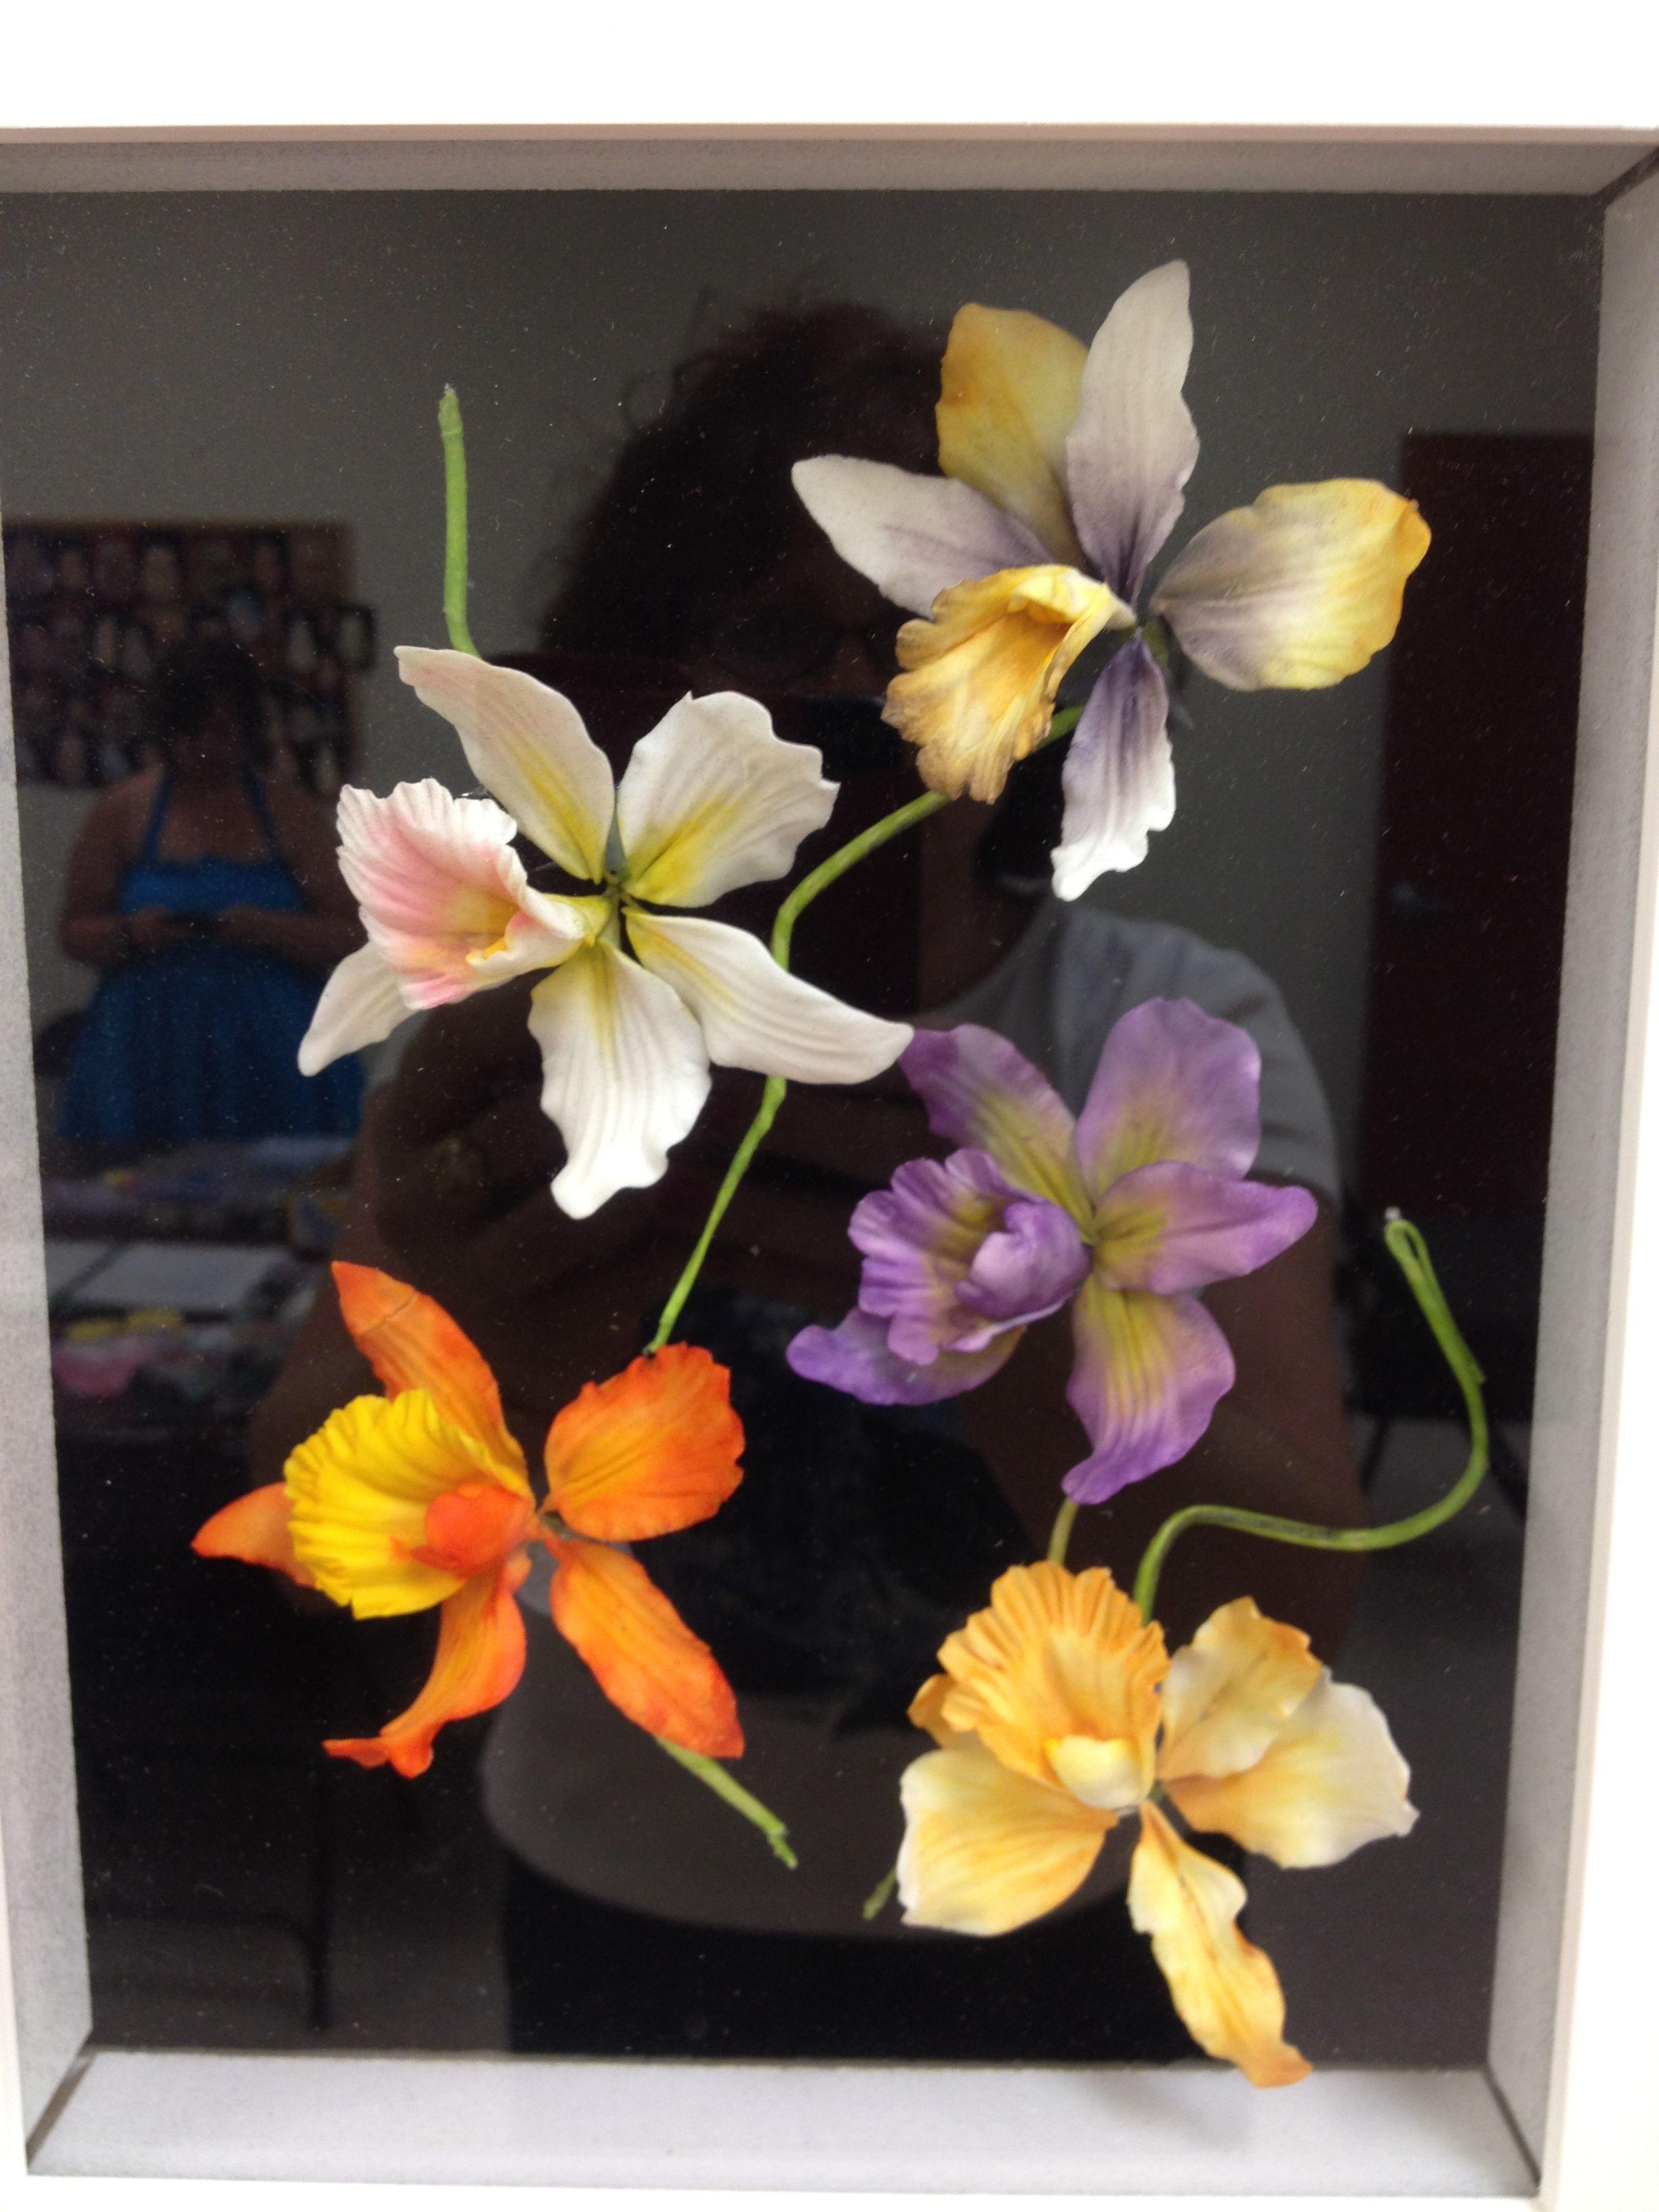 Gumpaste Cattleya Orchids Cold Porcelain Flowers Foam Flowers Sugar Flowers